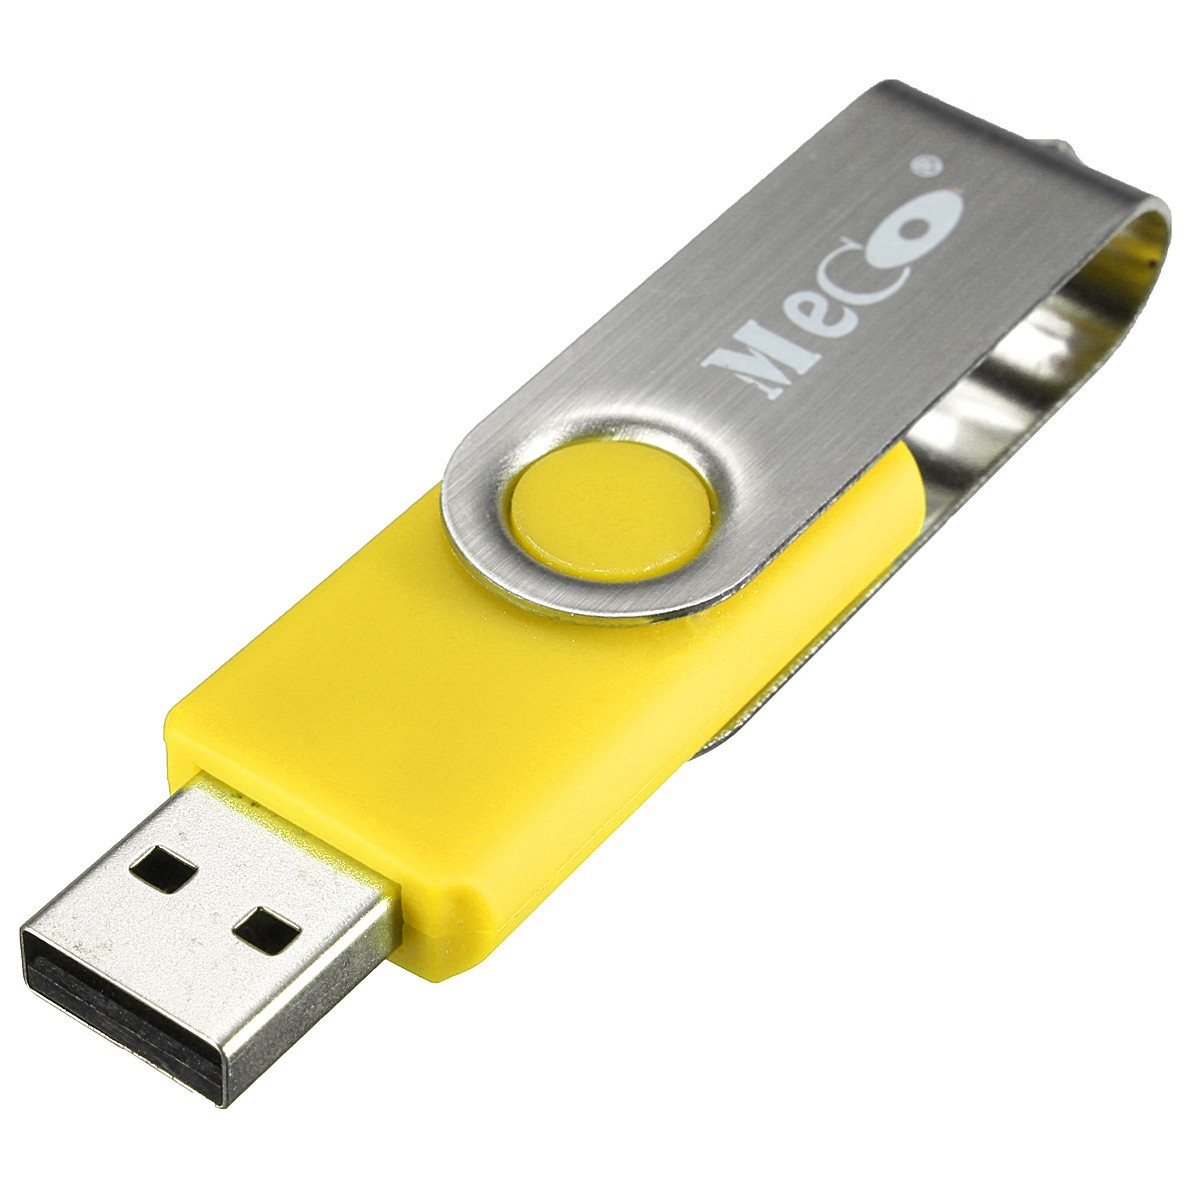 4G USB 2.0 Flash Drive Memory Stick Thumb Pen U Disk Storage Lot Gift